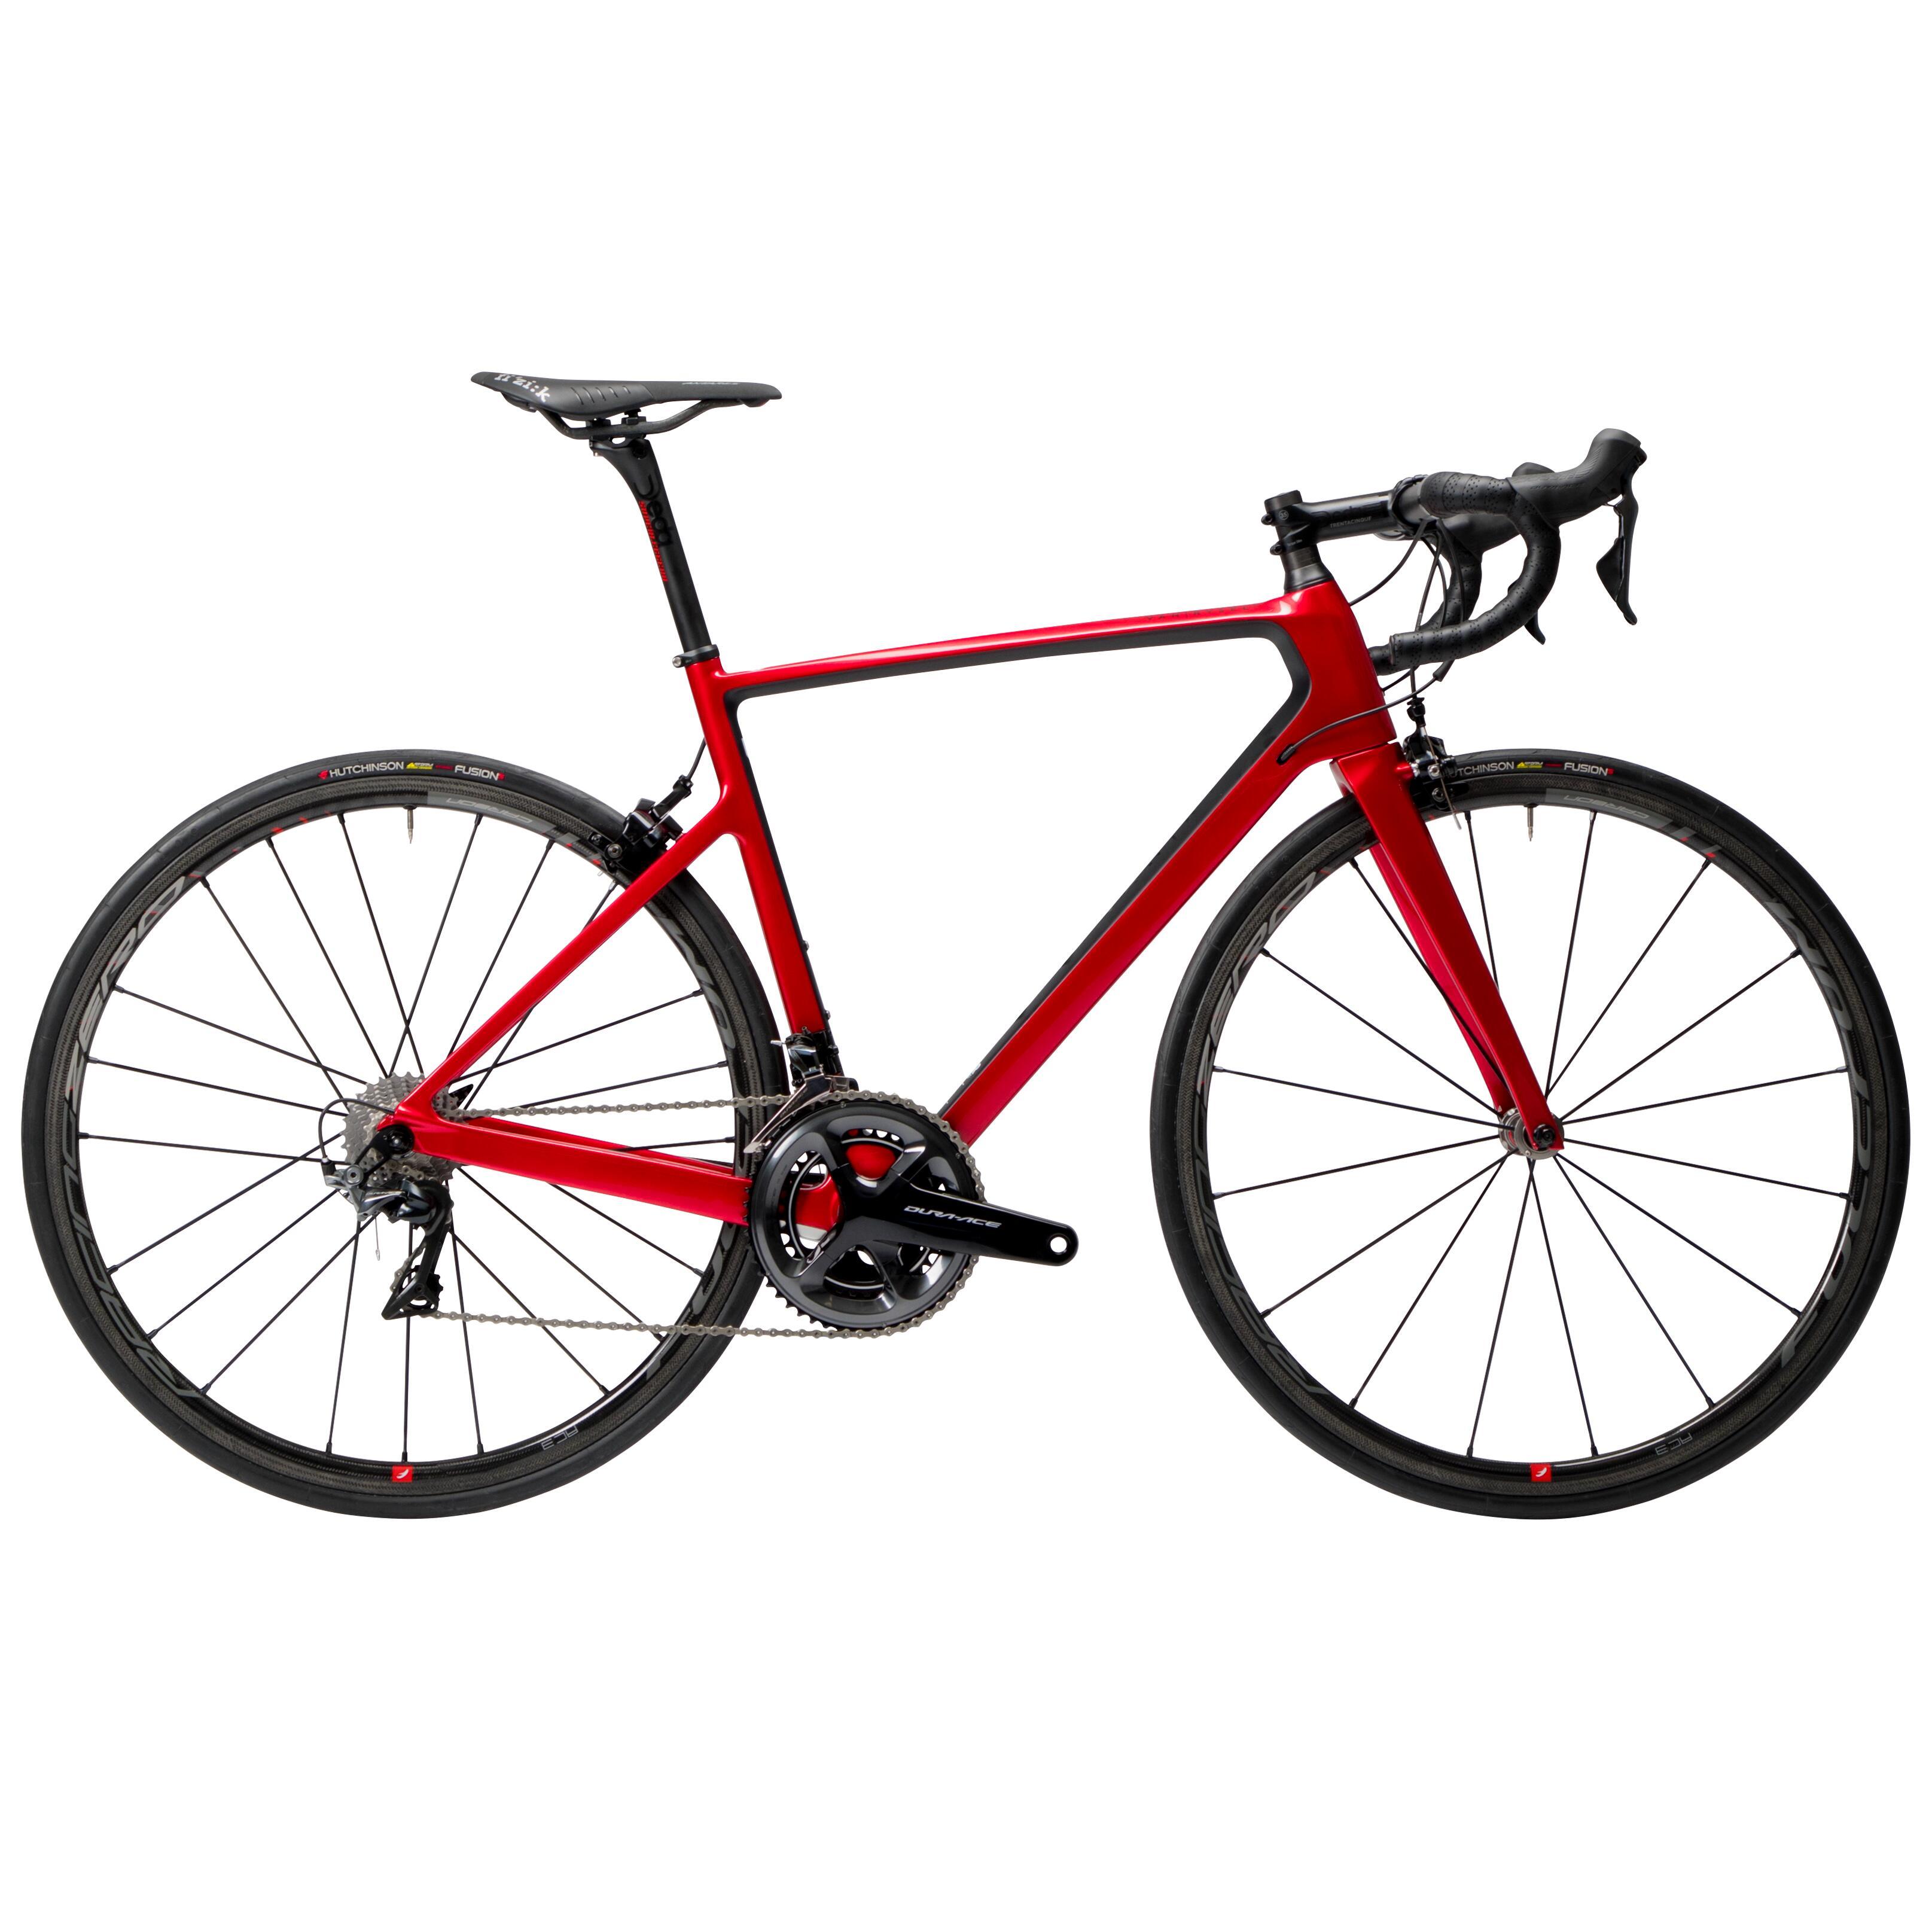 Bicicletă EDR 940 CF